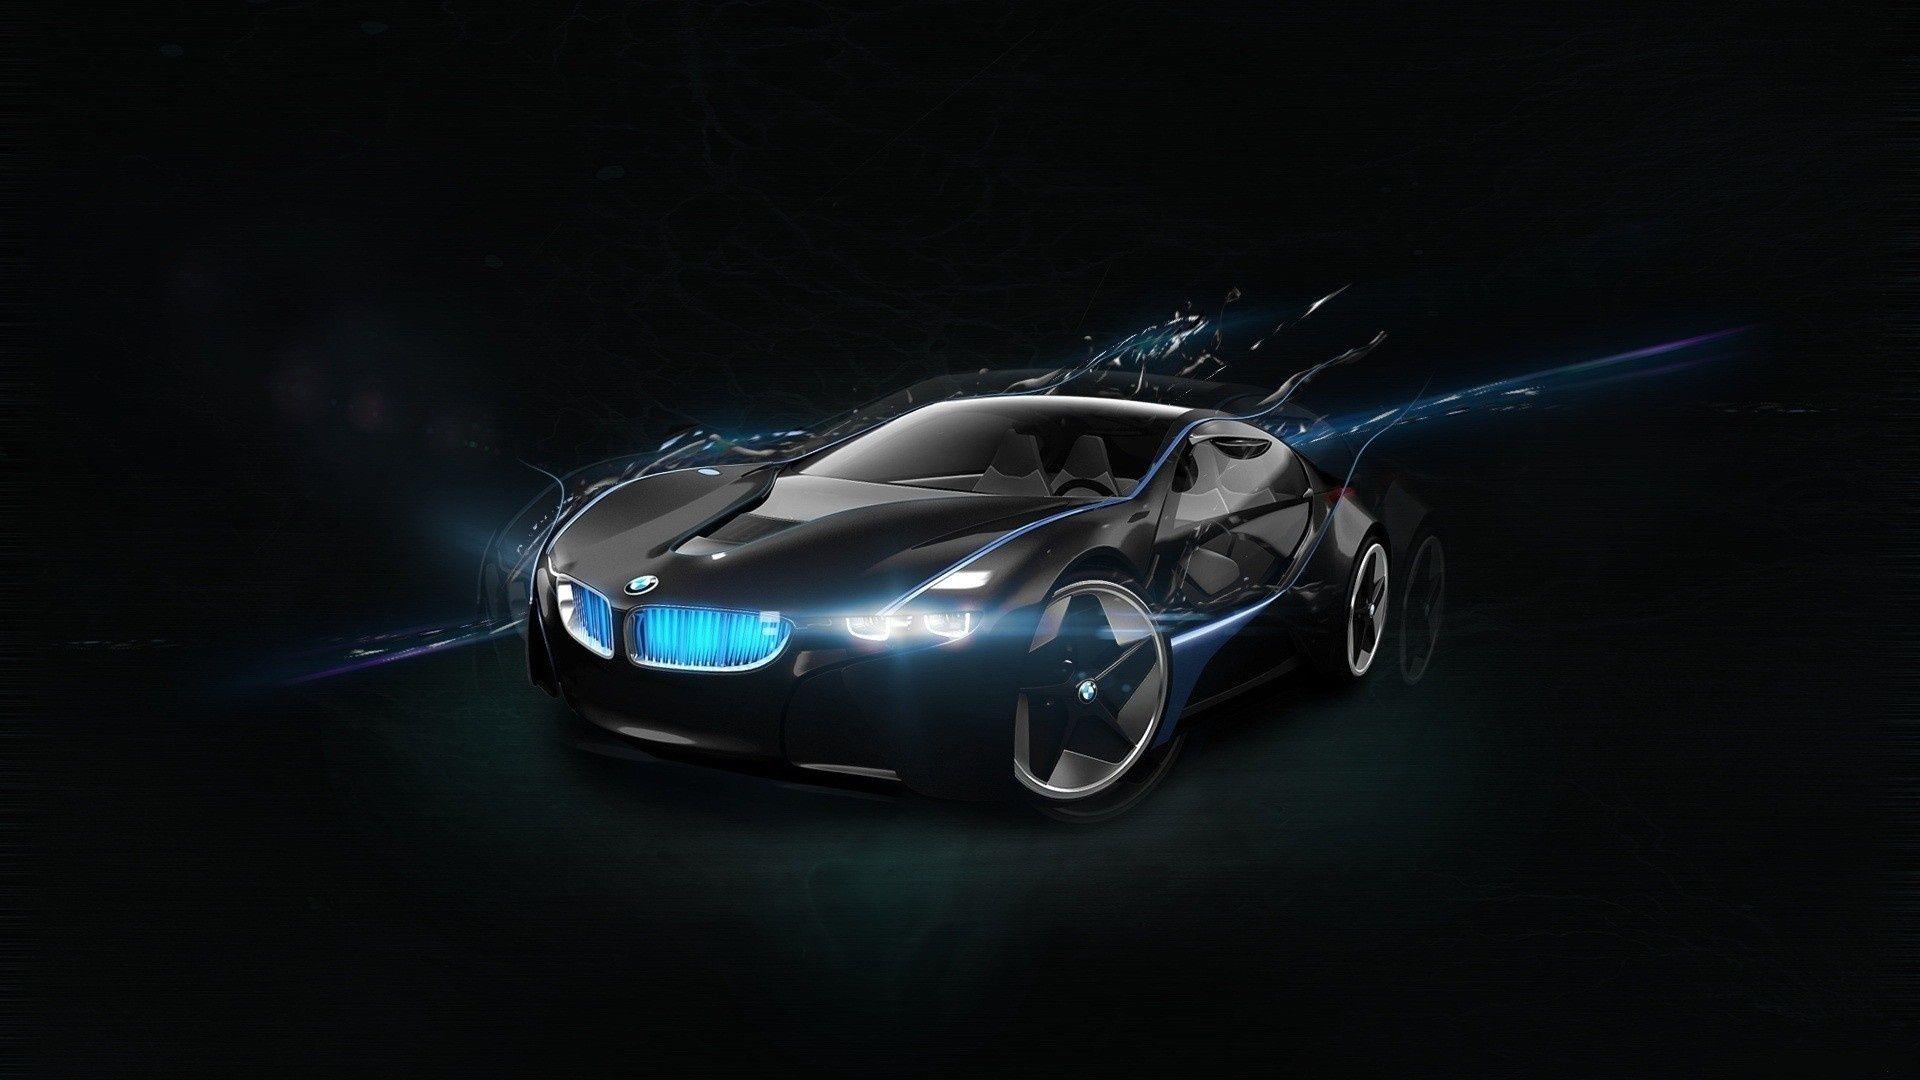 bmw, bmw hd wa super wallpaper hd porsche super car